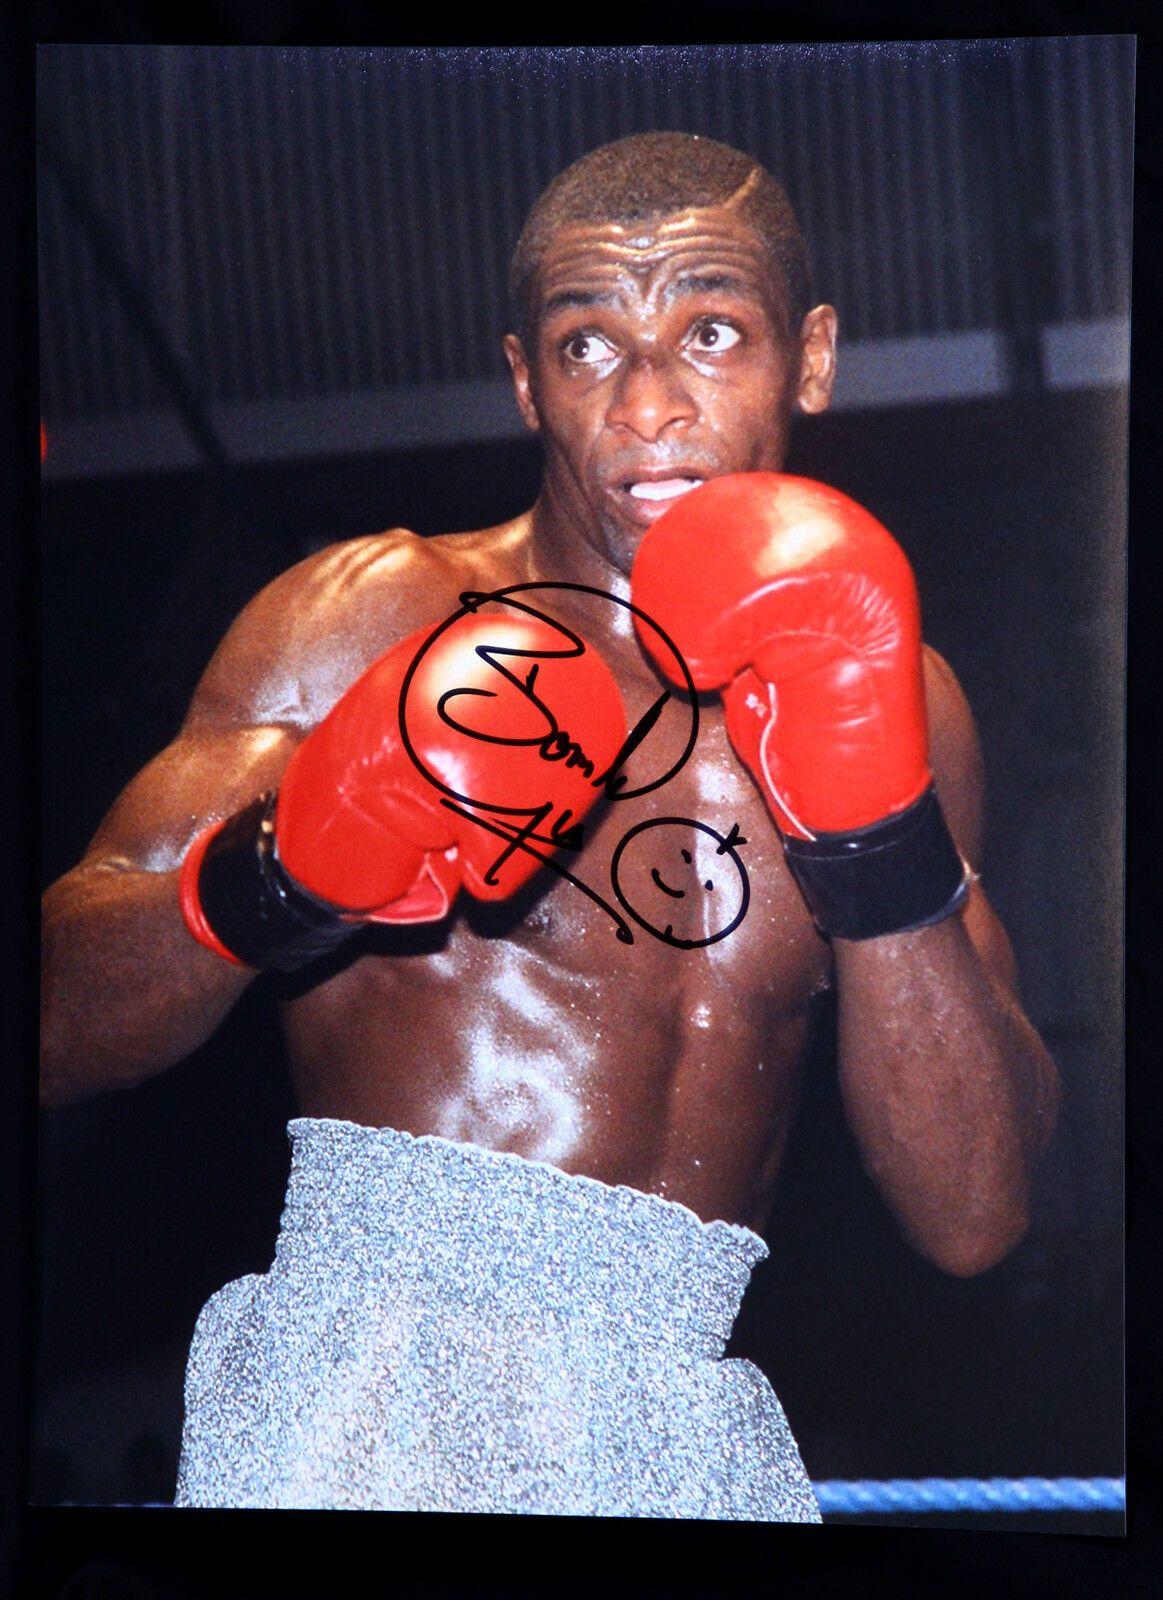 Herol Bomber Graham Signed 12x16 Boxing Photograph : B